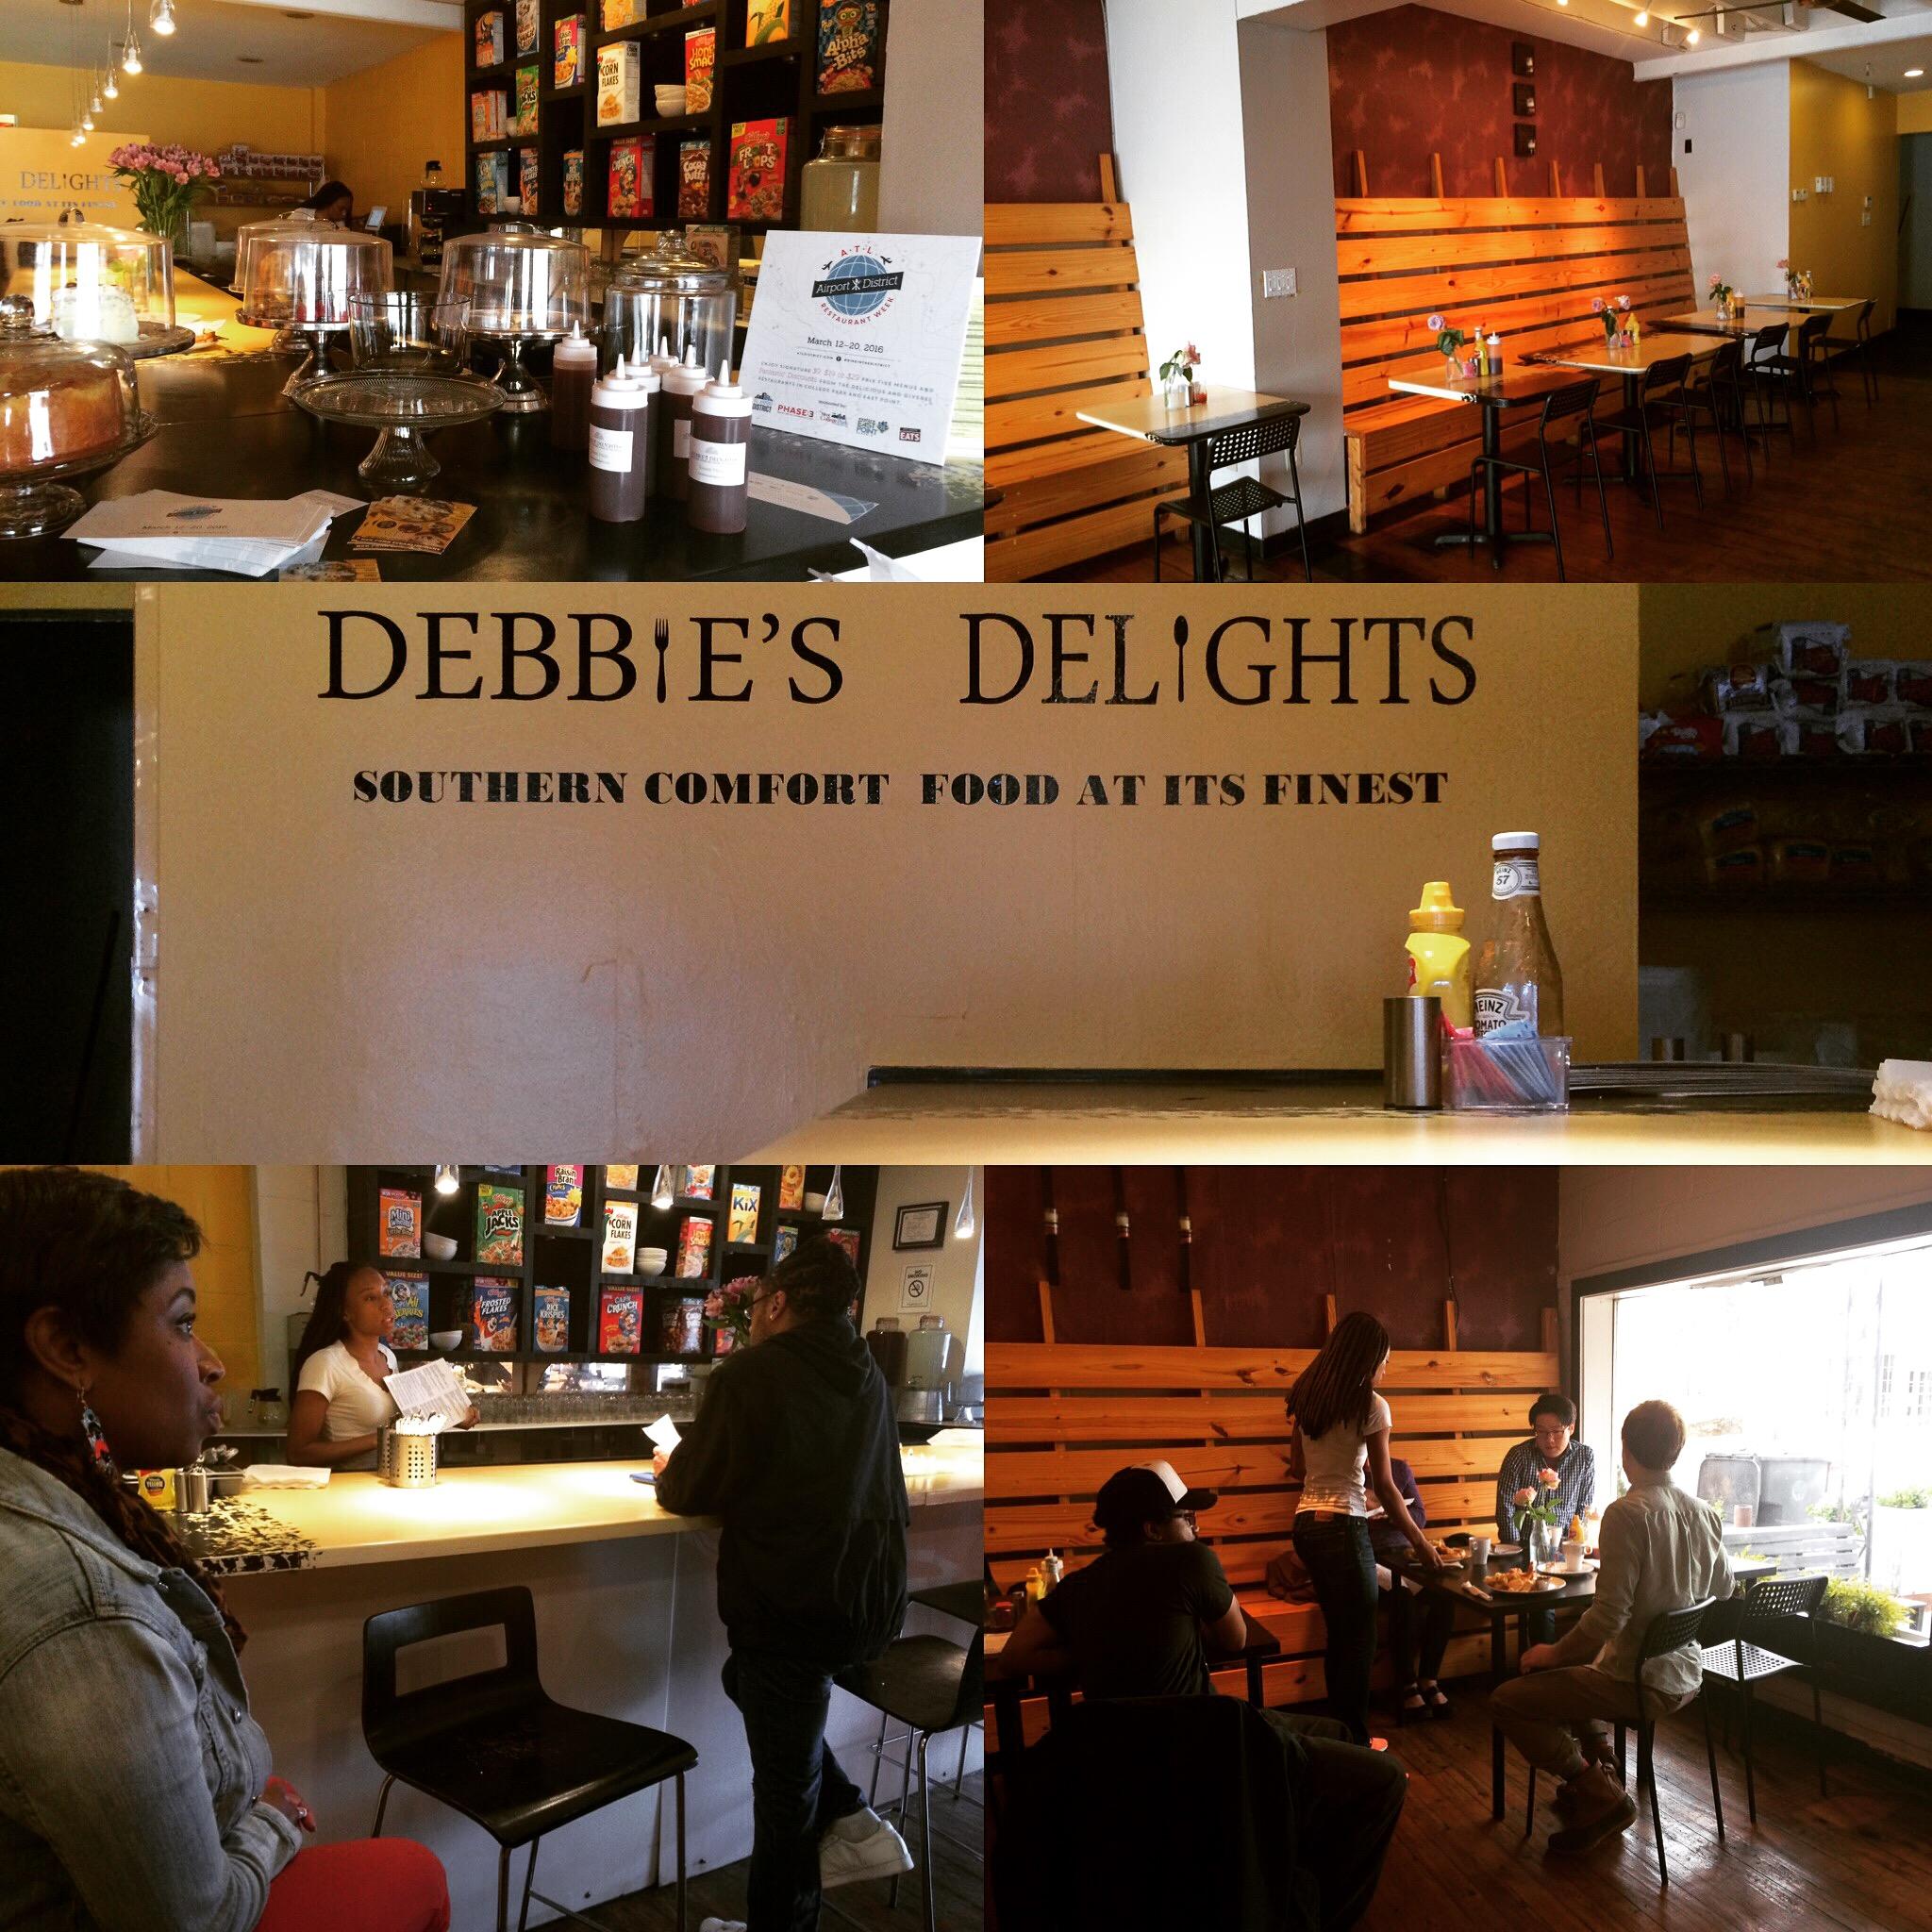 Debbie's Delights